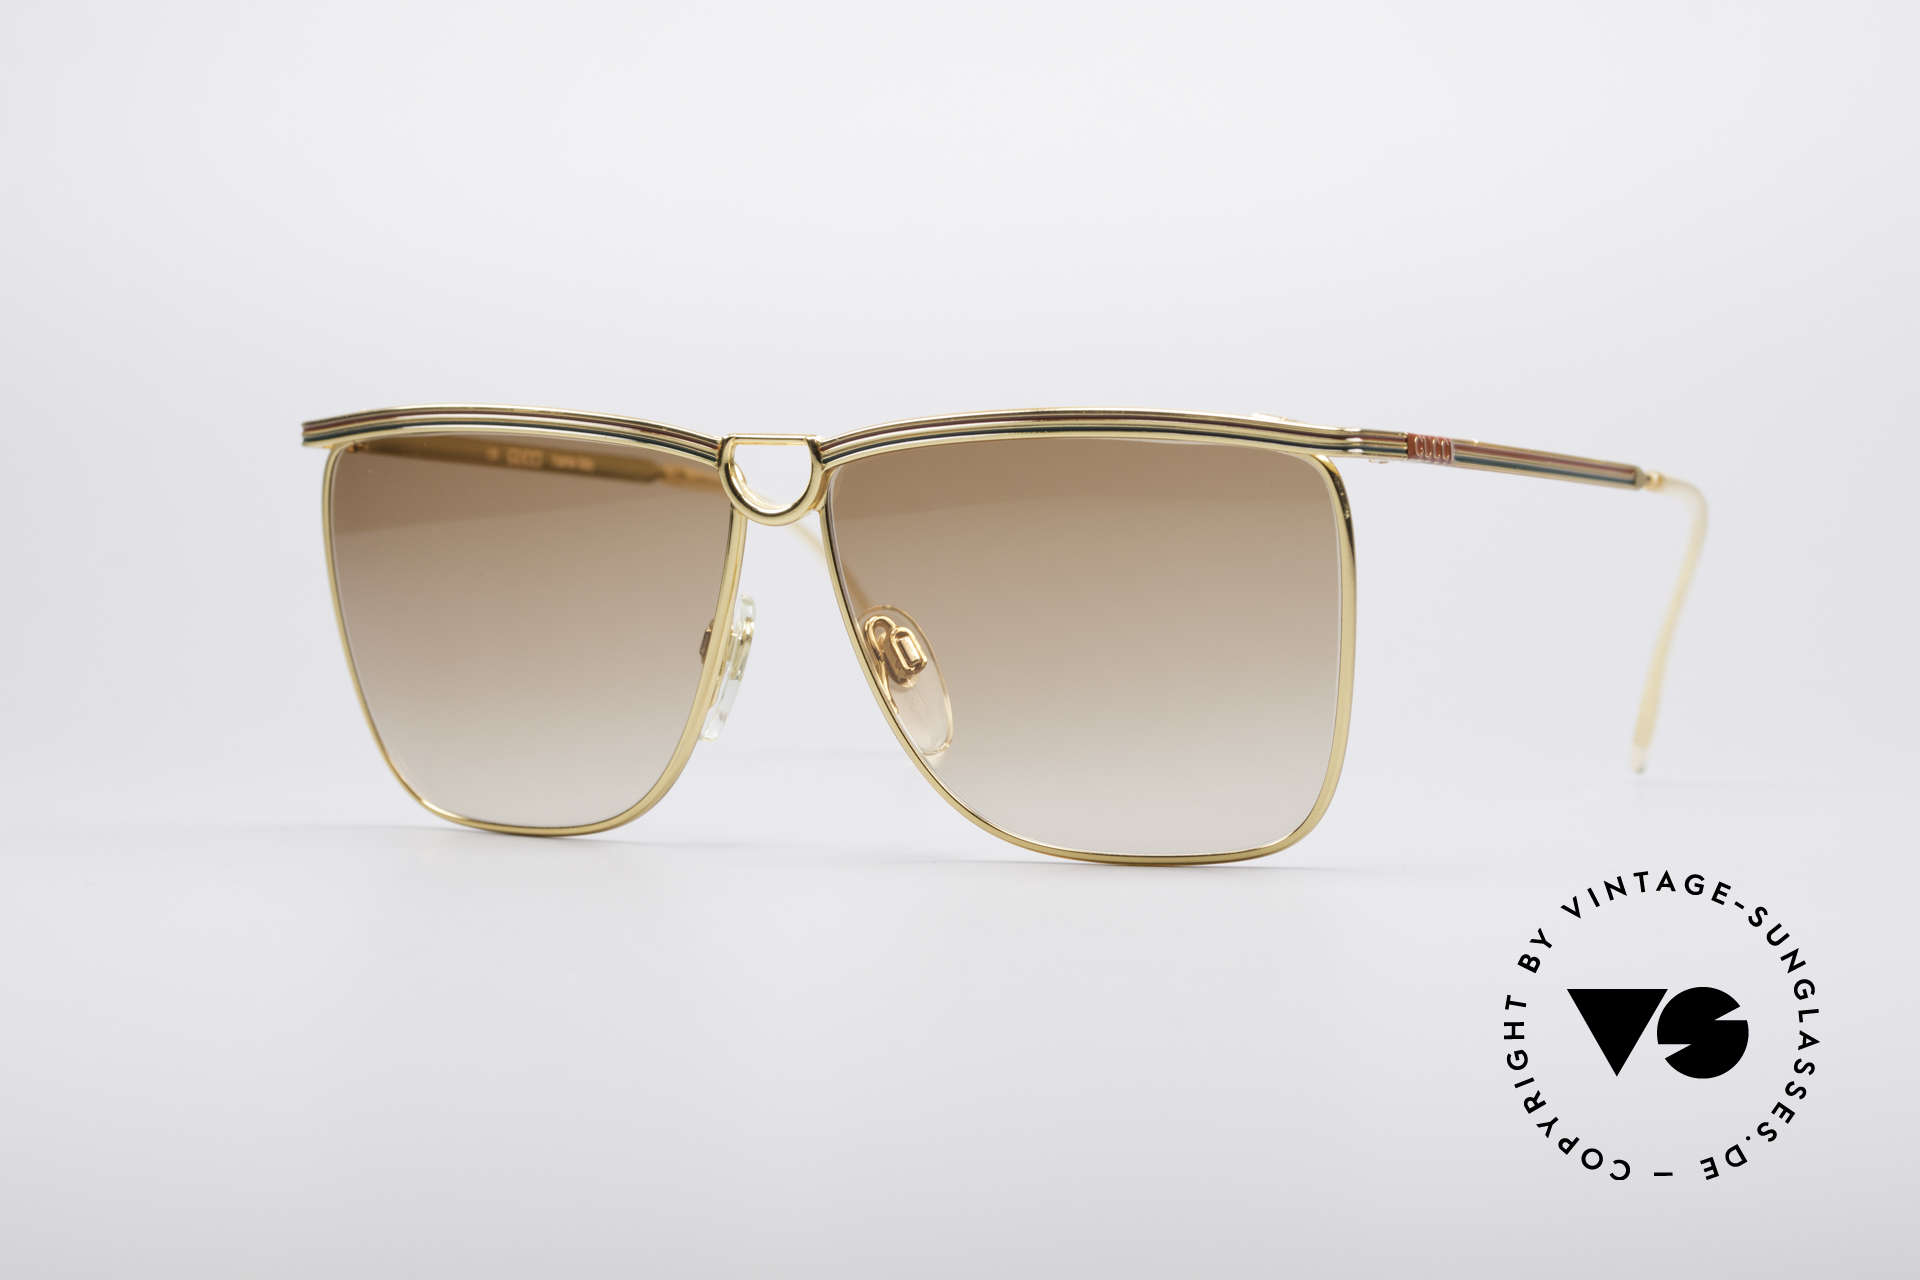 645d99df04c Sunglasses Gucci 2204 70 s Designer Sunglasses